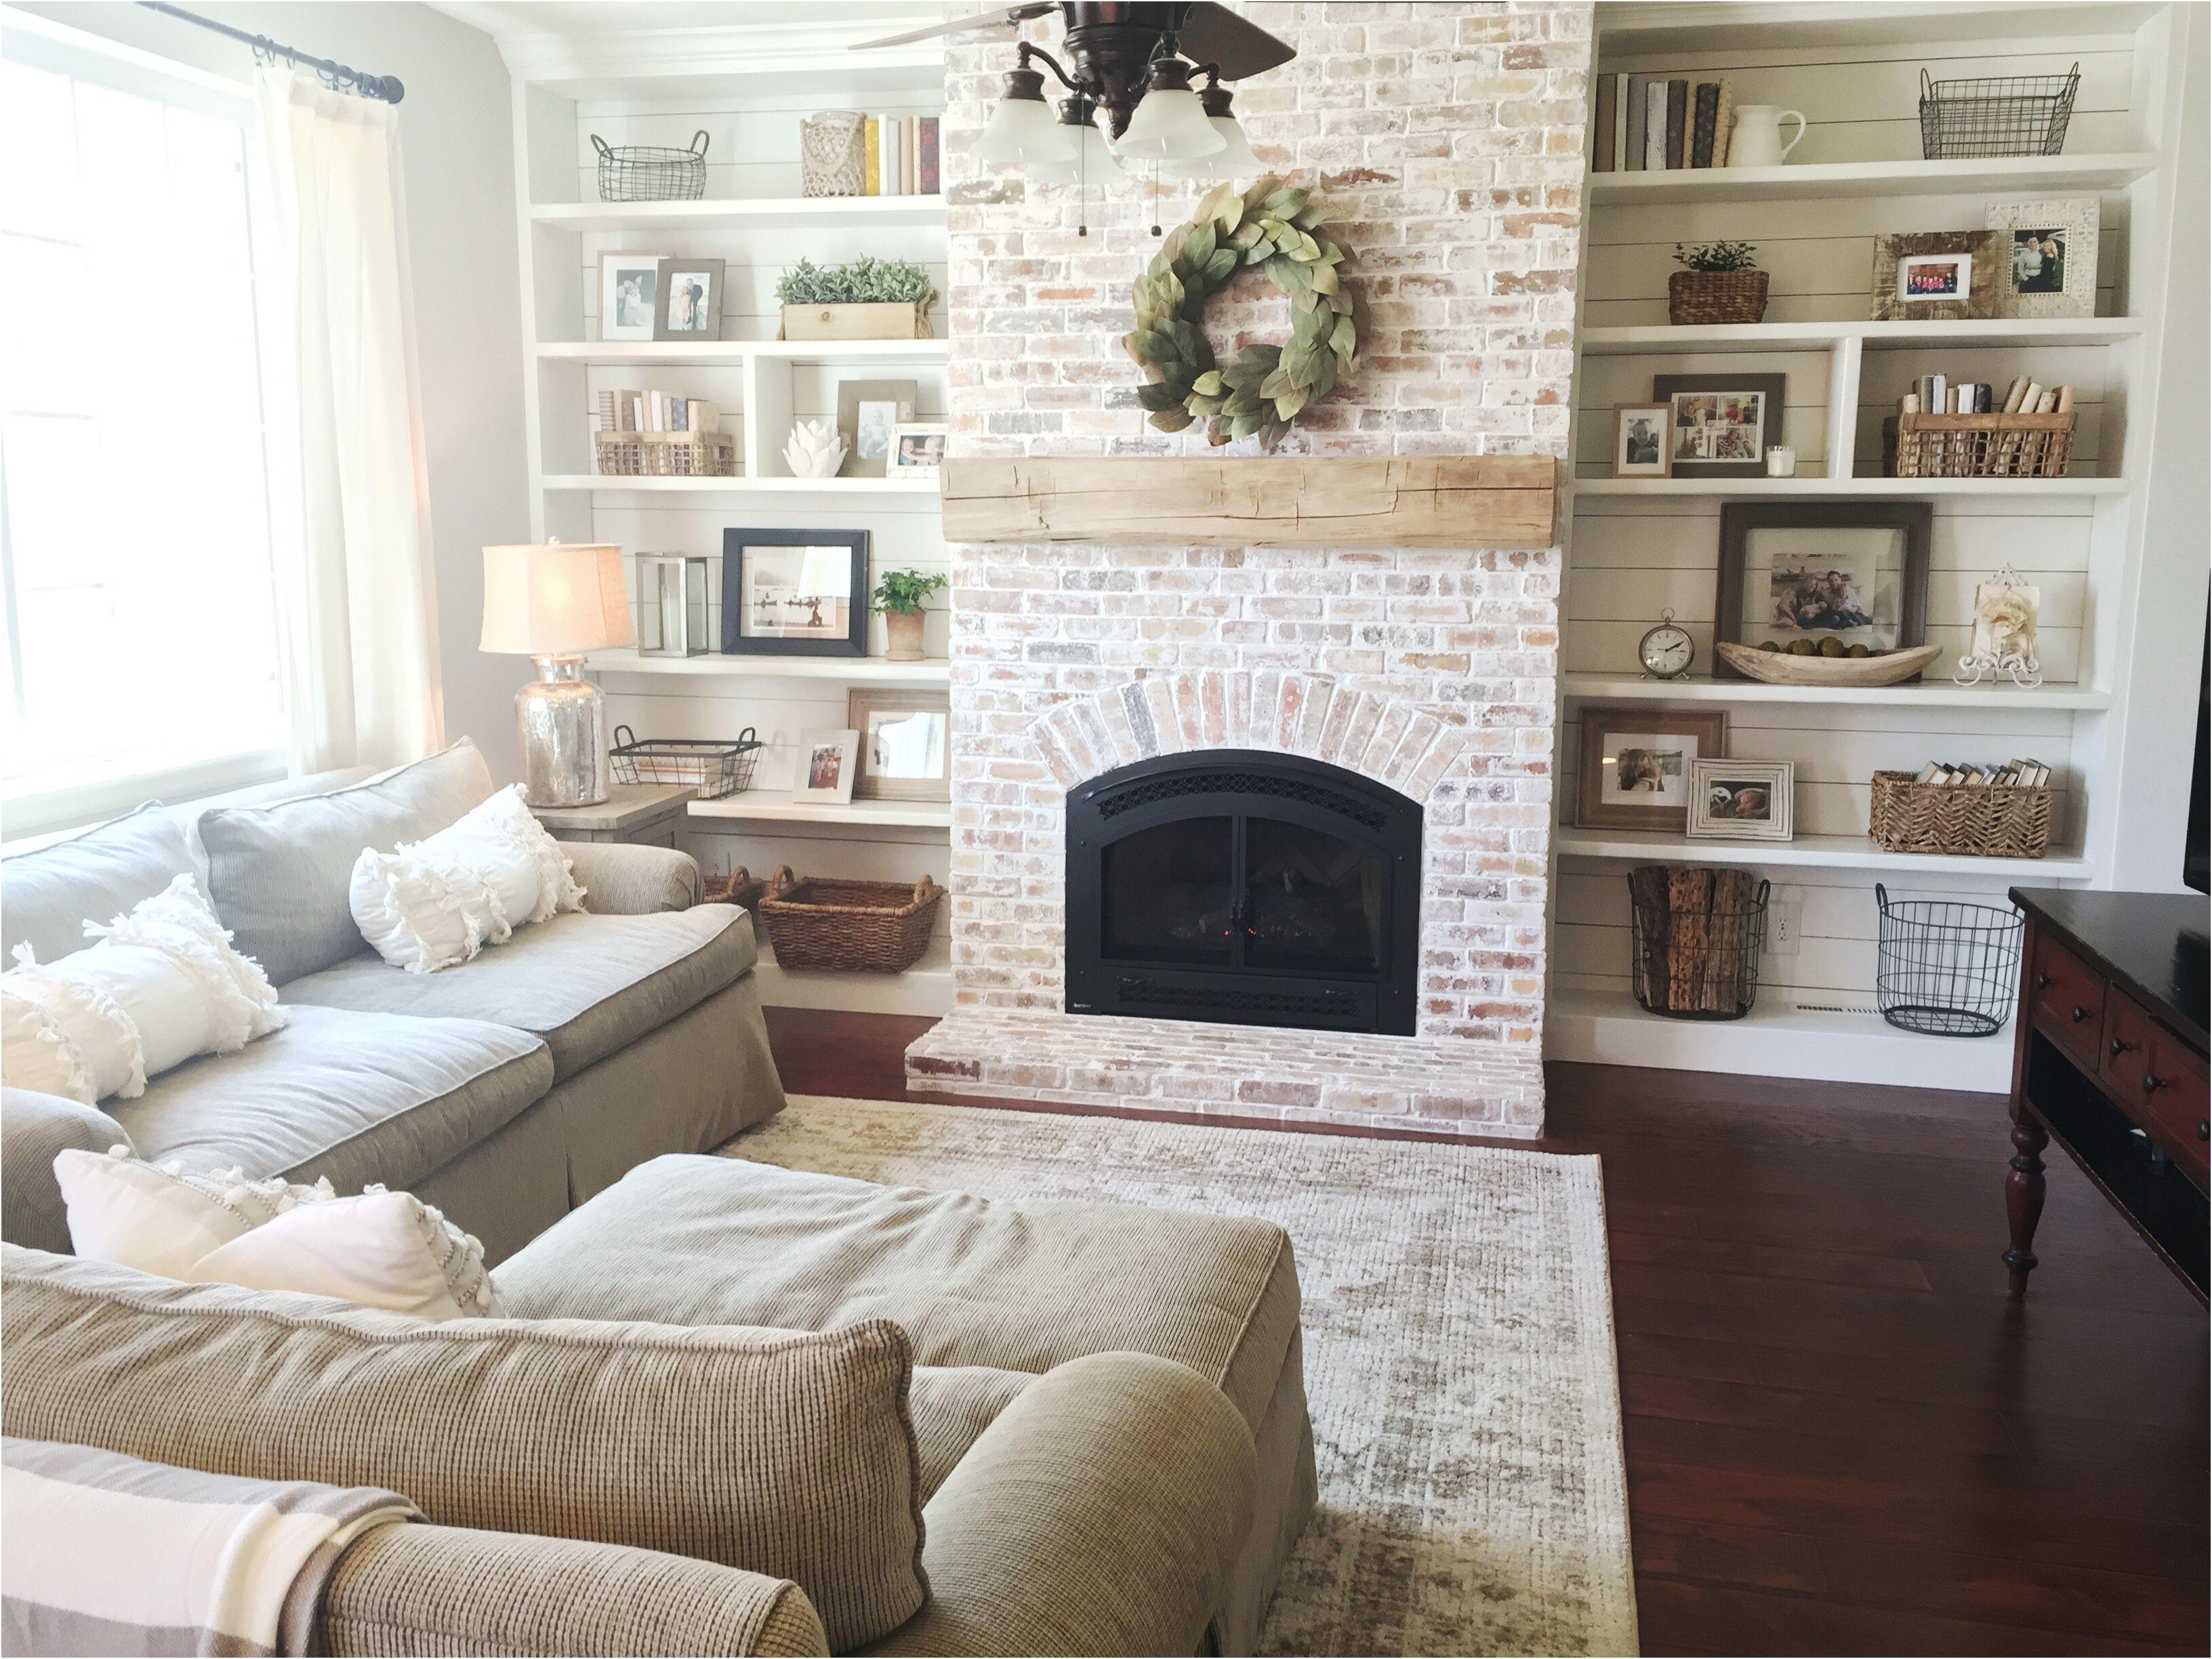 Inspirational Fireplace Wall Ideas